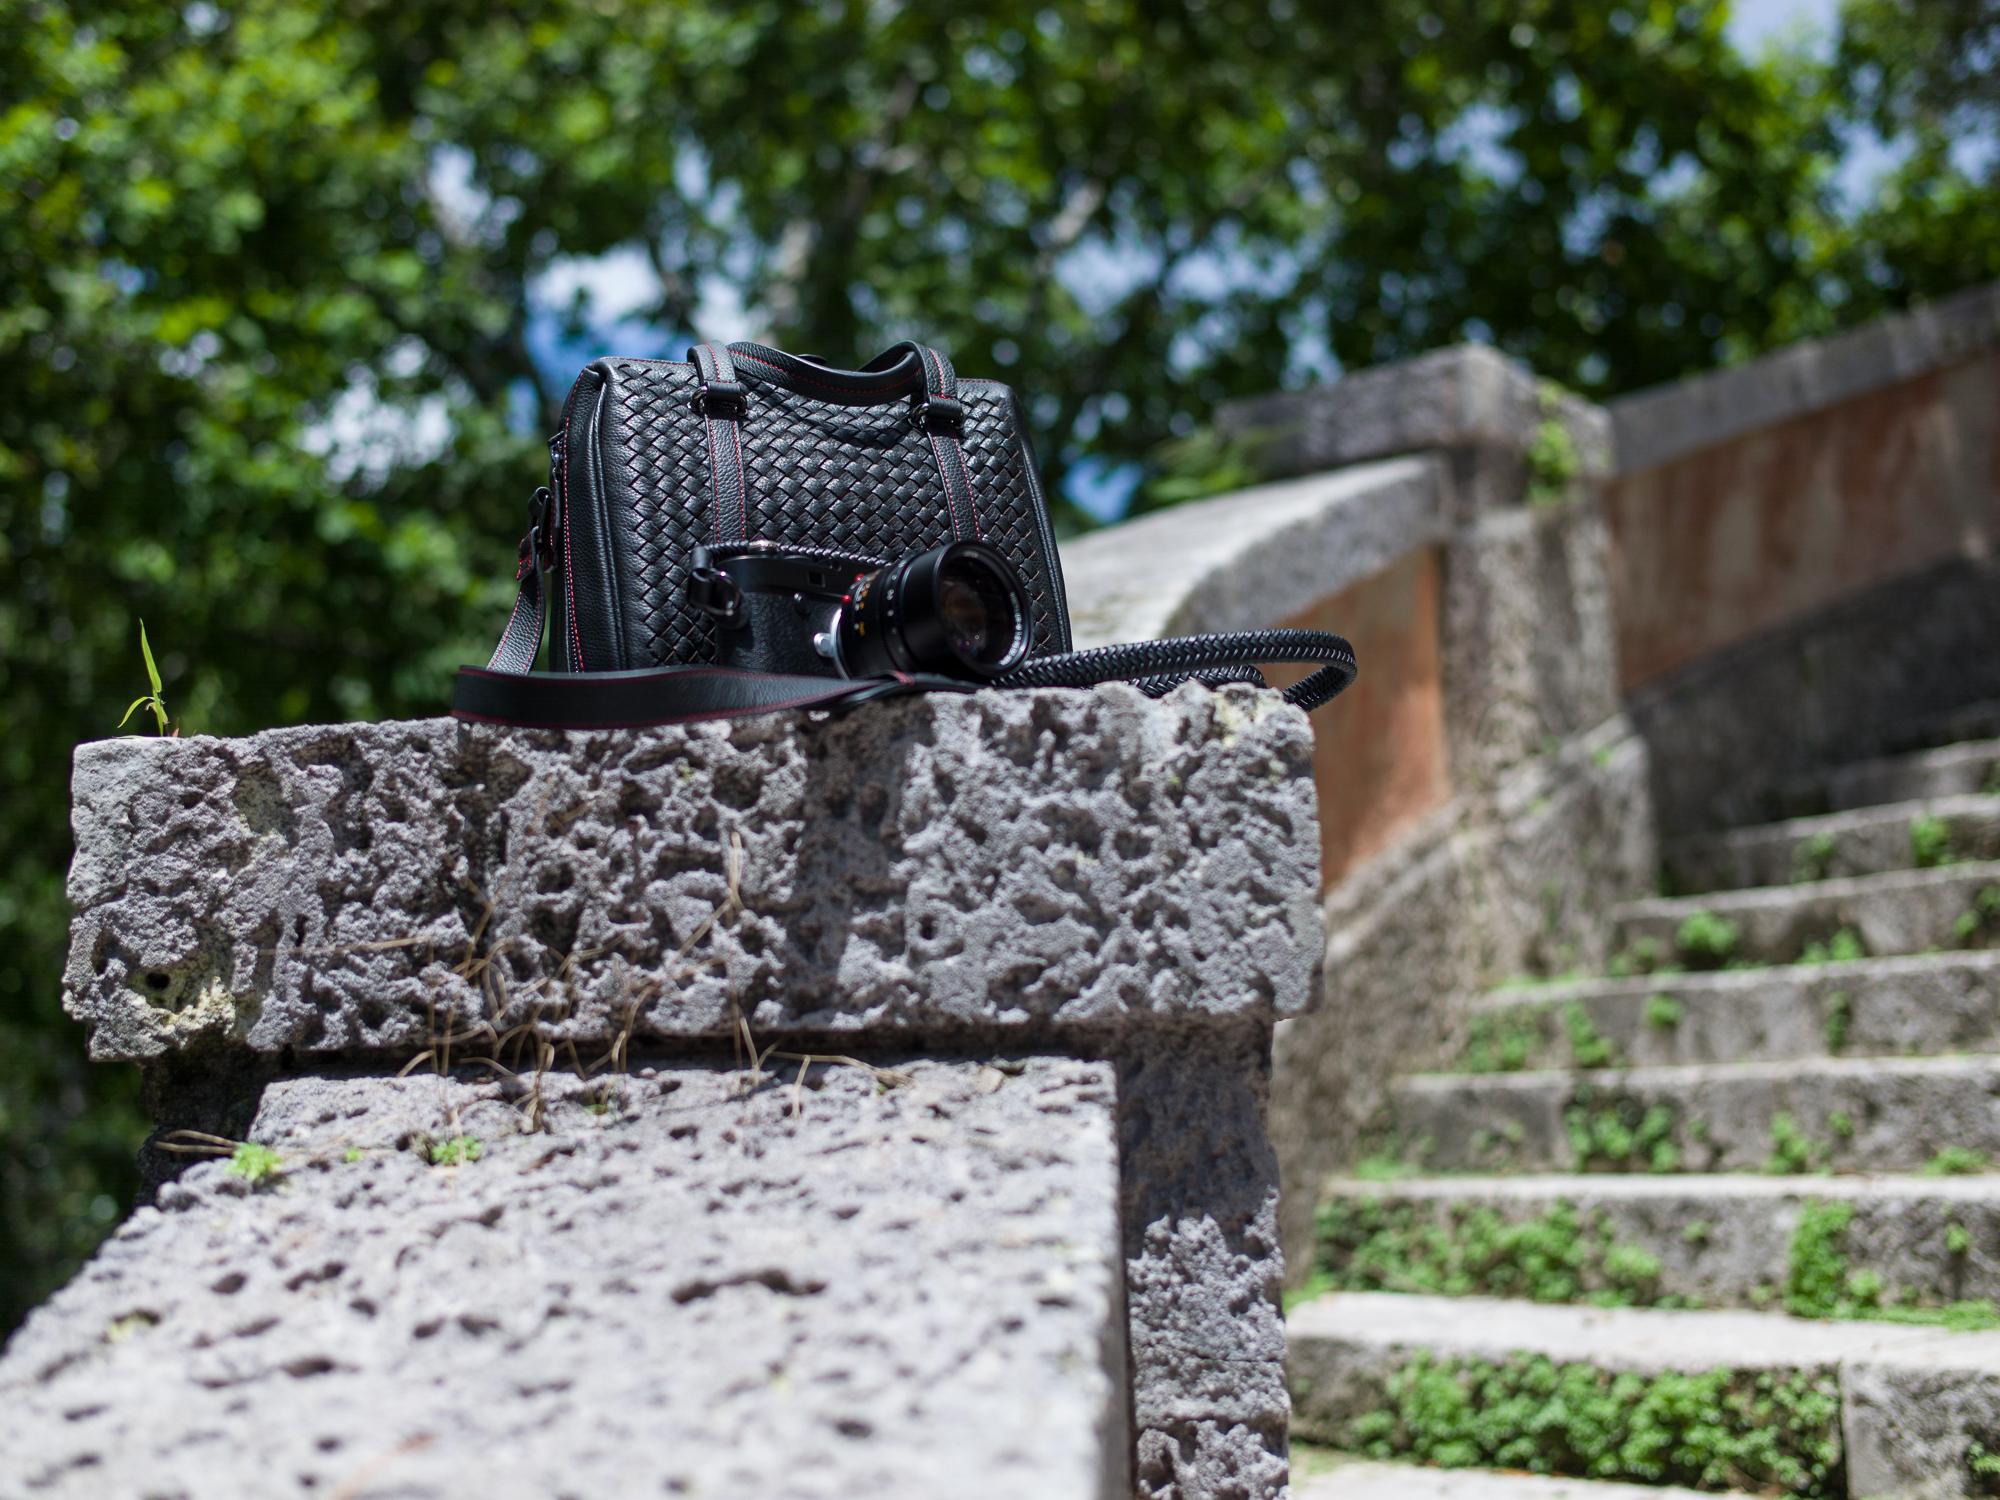 Vi Vante calibre bag Matador Noir braided leather 2 camera strap leica m10 noctilux.jpg